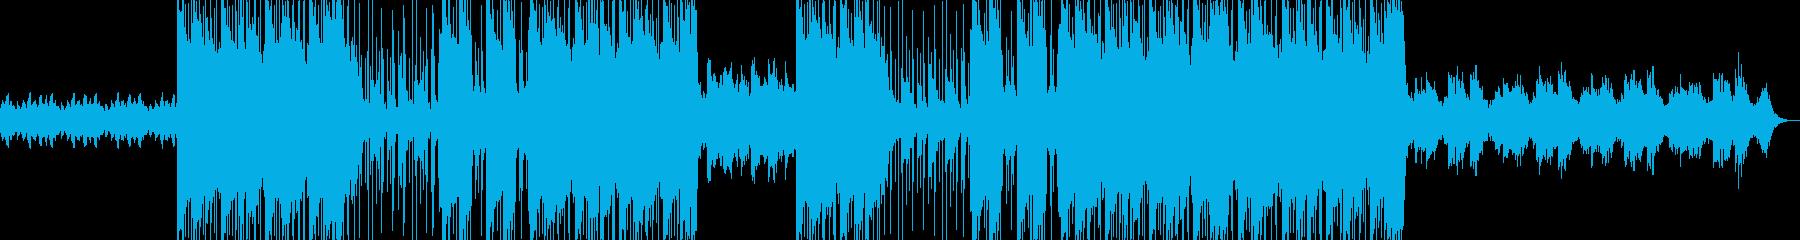 Trap, HIp Hopの再生済みの波形